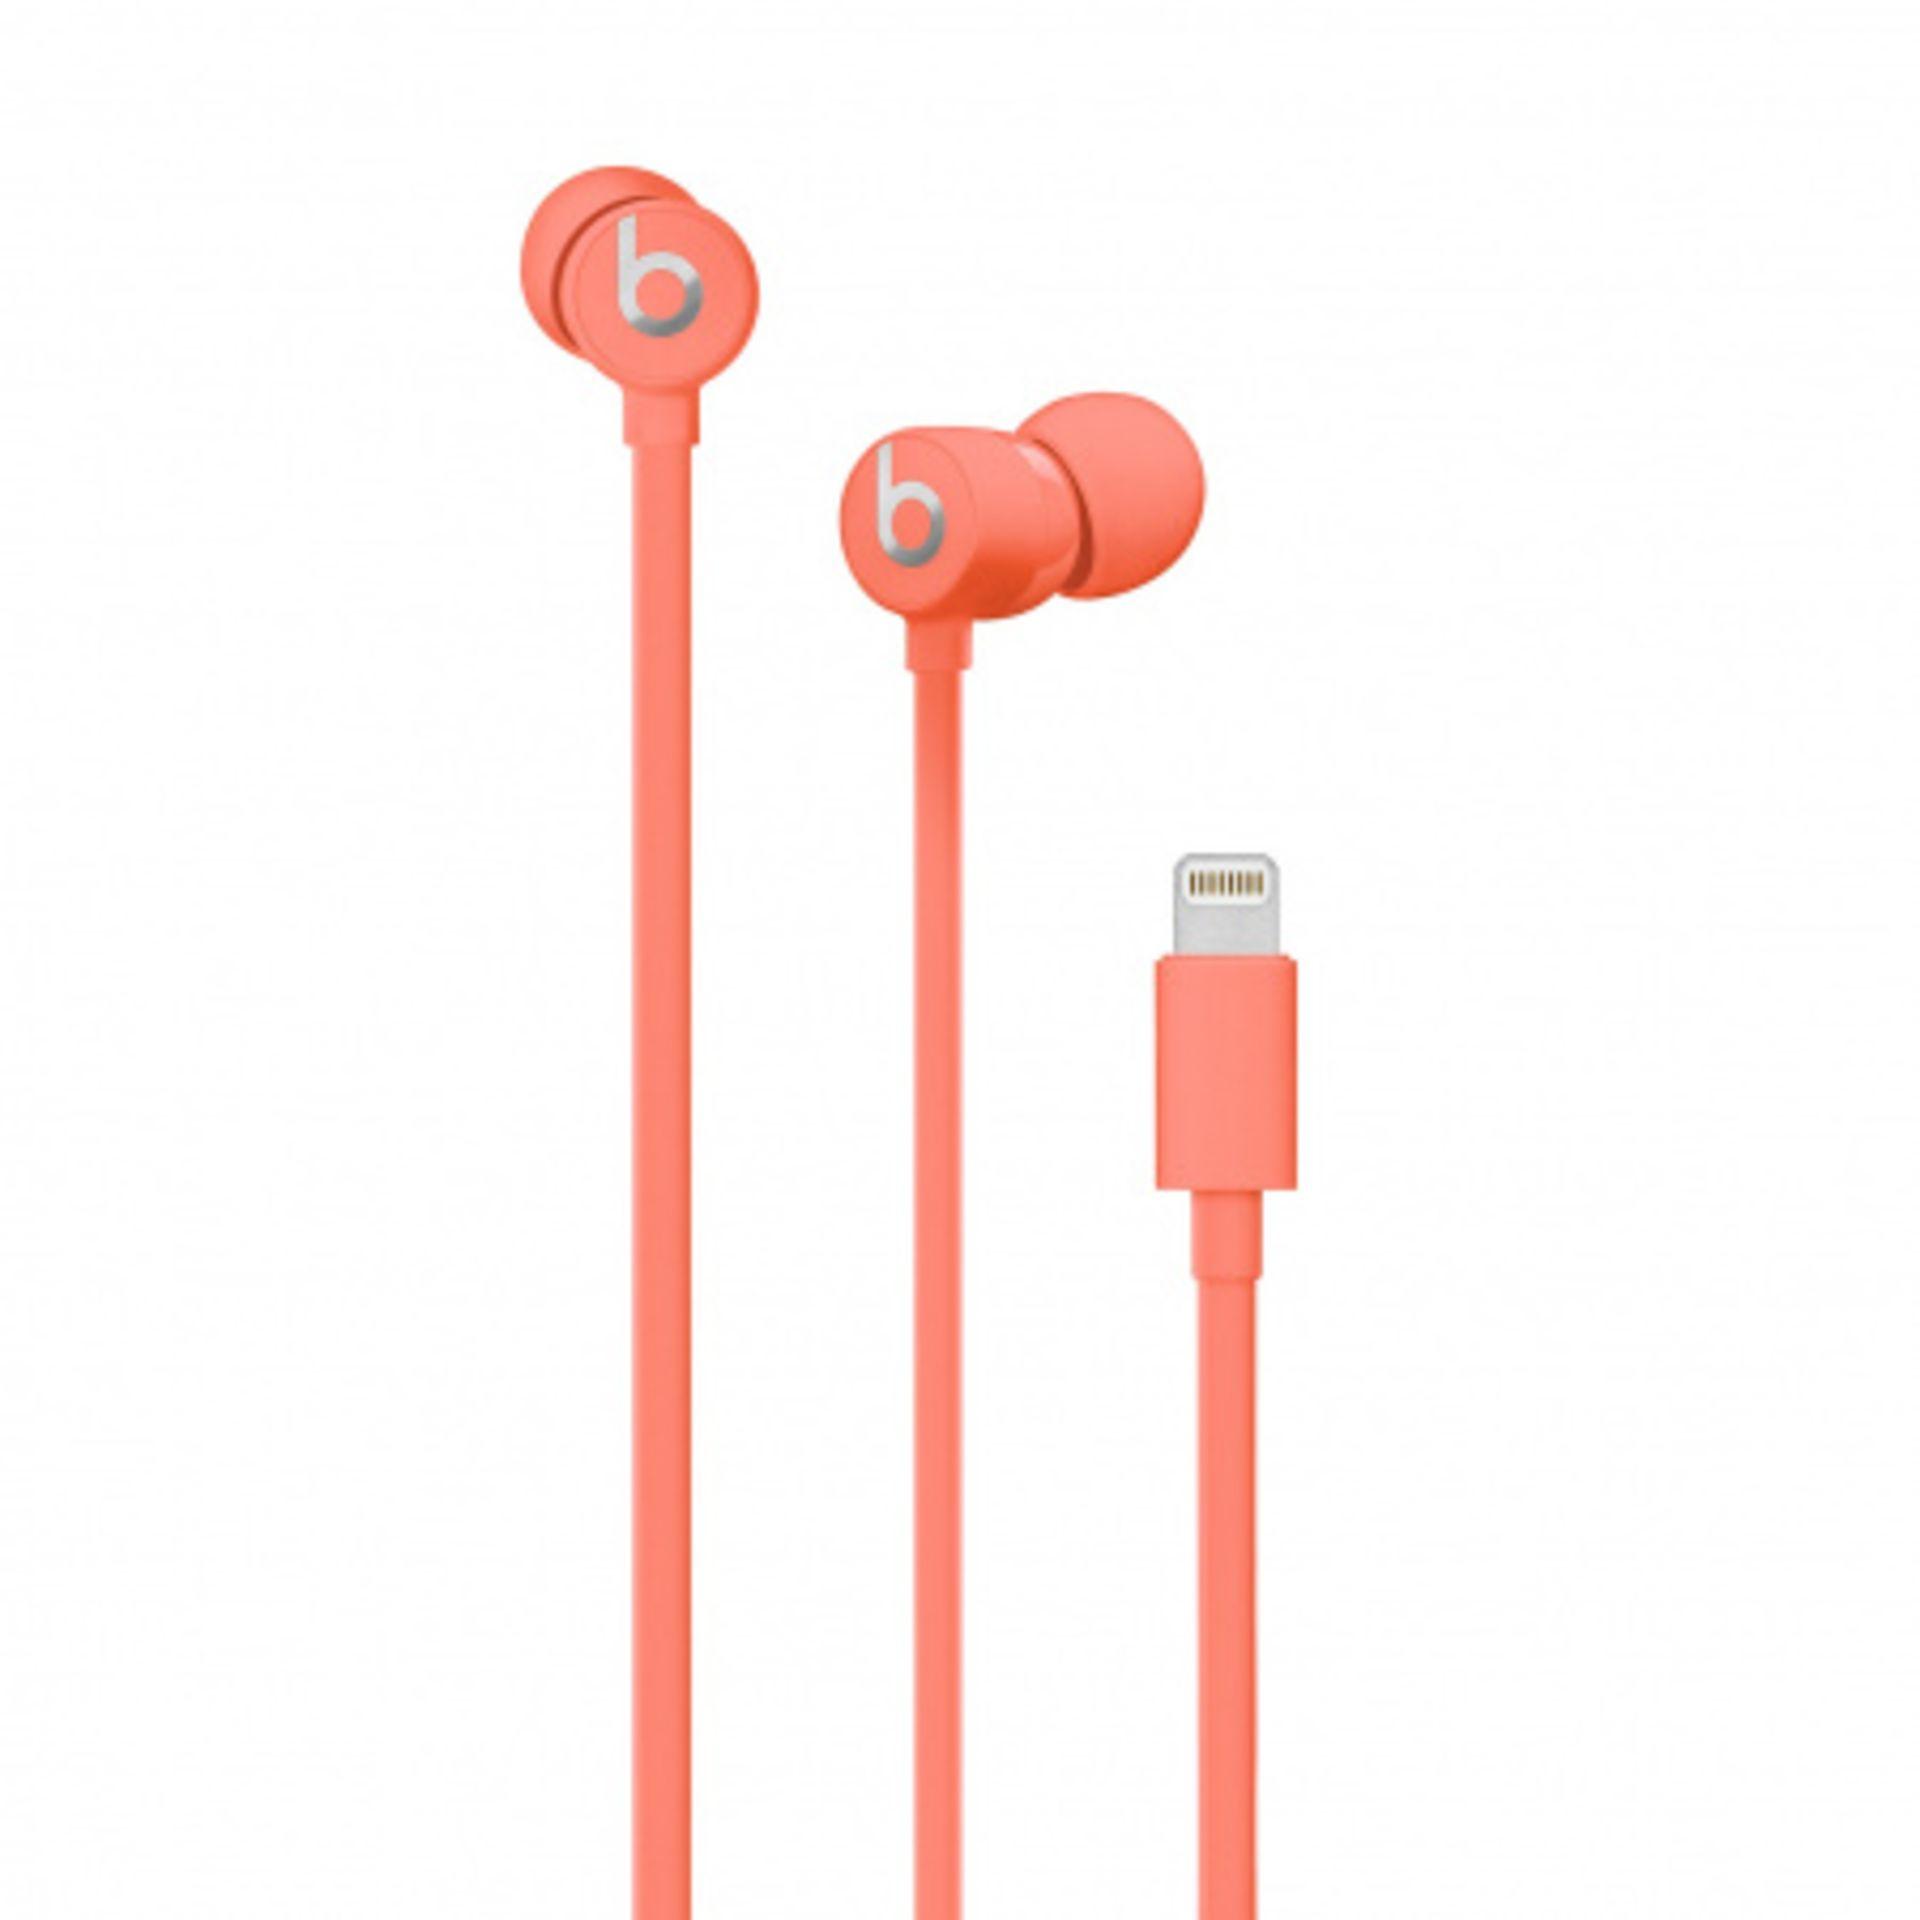 + VAT Brand New UrBeats 3 Earphones With Lightning Connector - Coral - Ergonomic Design - High